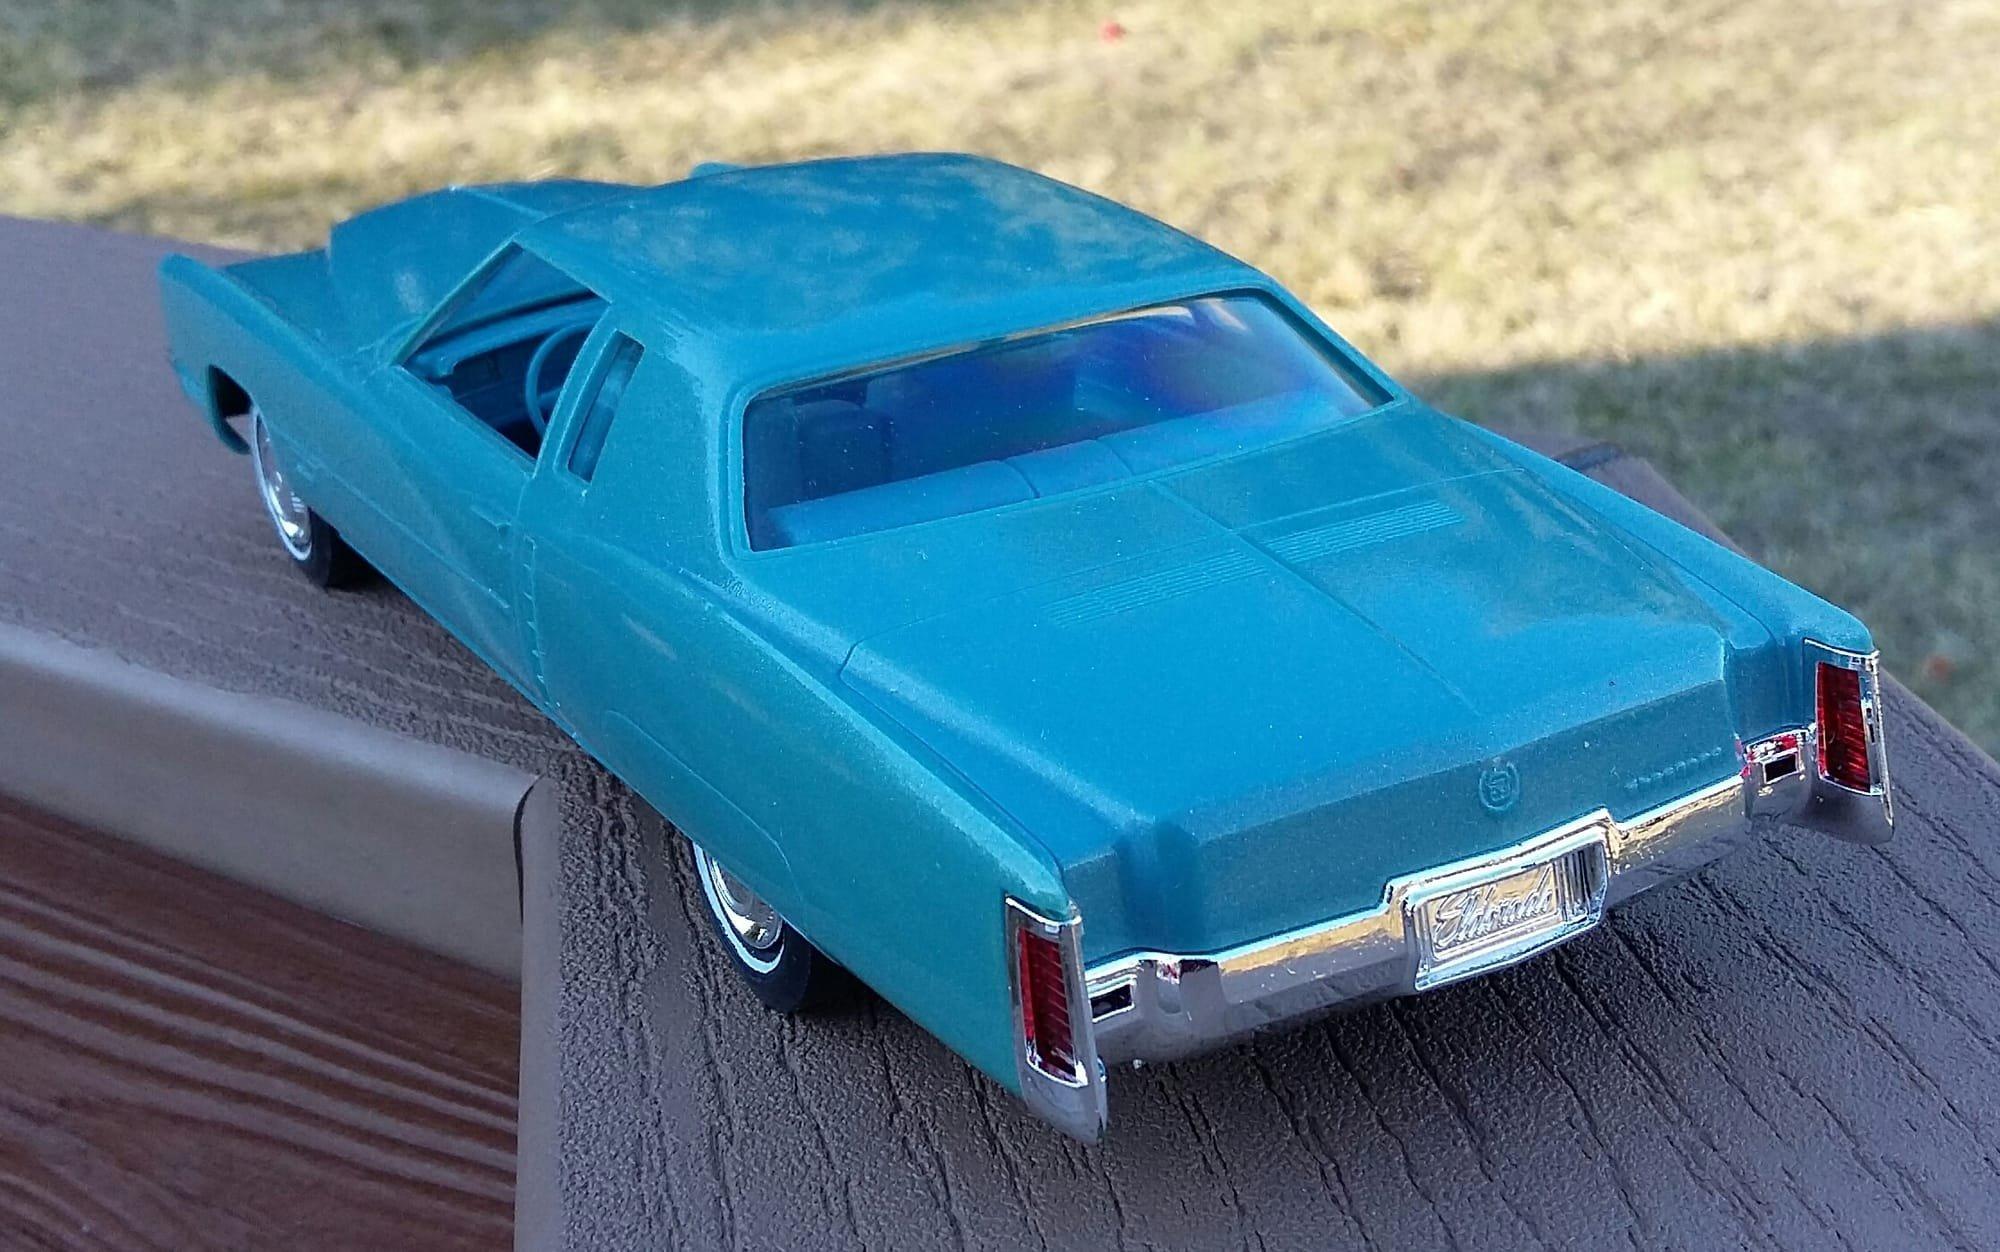 Obsolete Auto Dealer Showroom Collectibles Promos Toys 1971 El Dorado Headlight Wiring Harness Stock 8621971 Cadillac Eldorado Coupewith Free Us Shipping 48 States